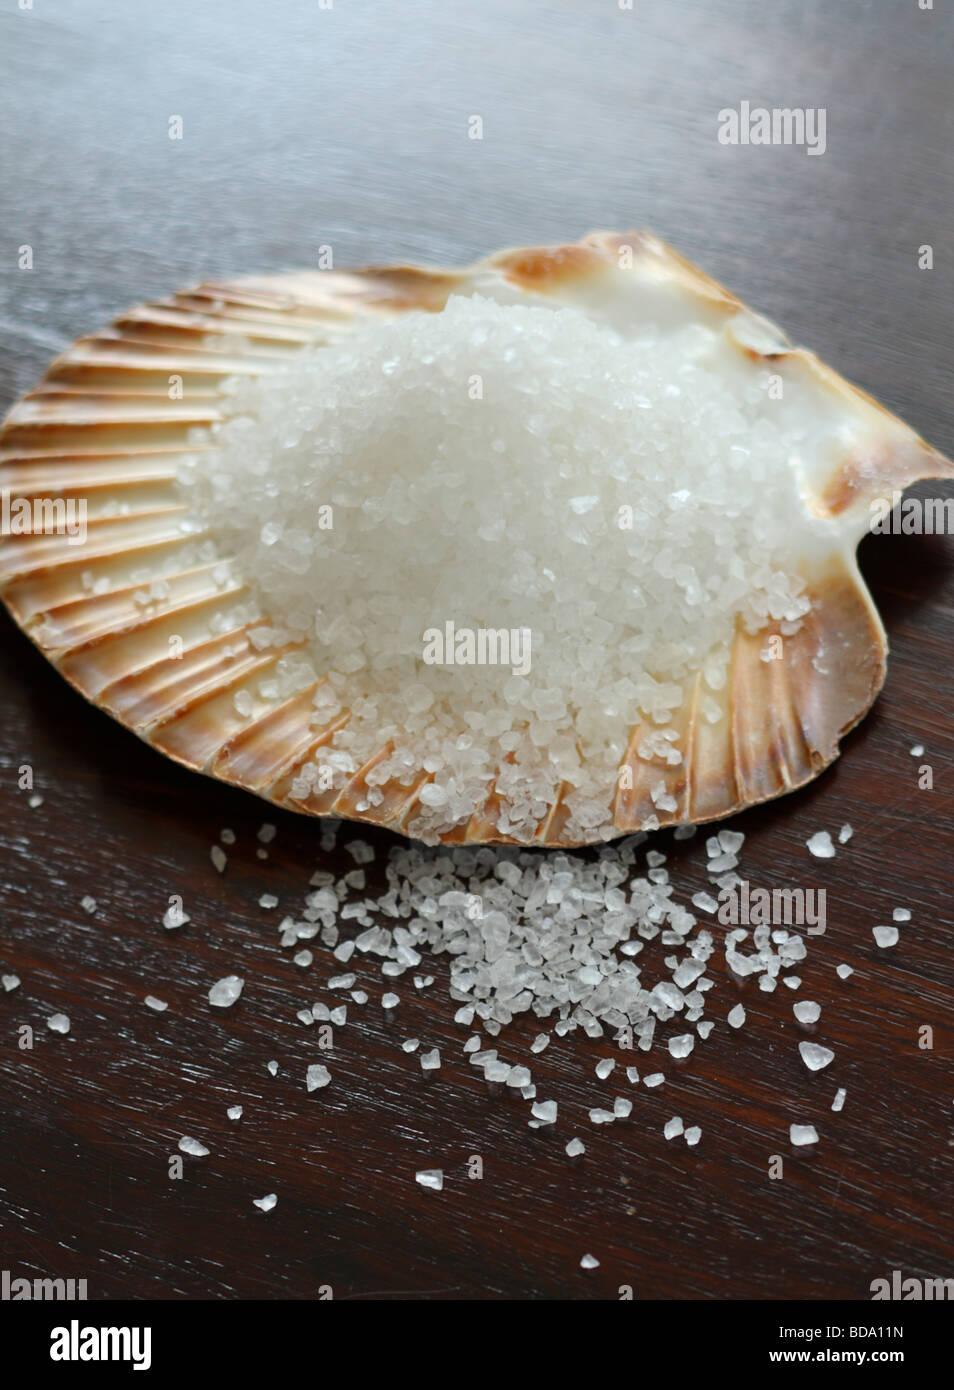 Meersalz in der Schale Stockbild